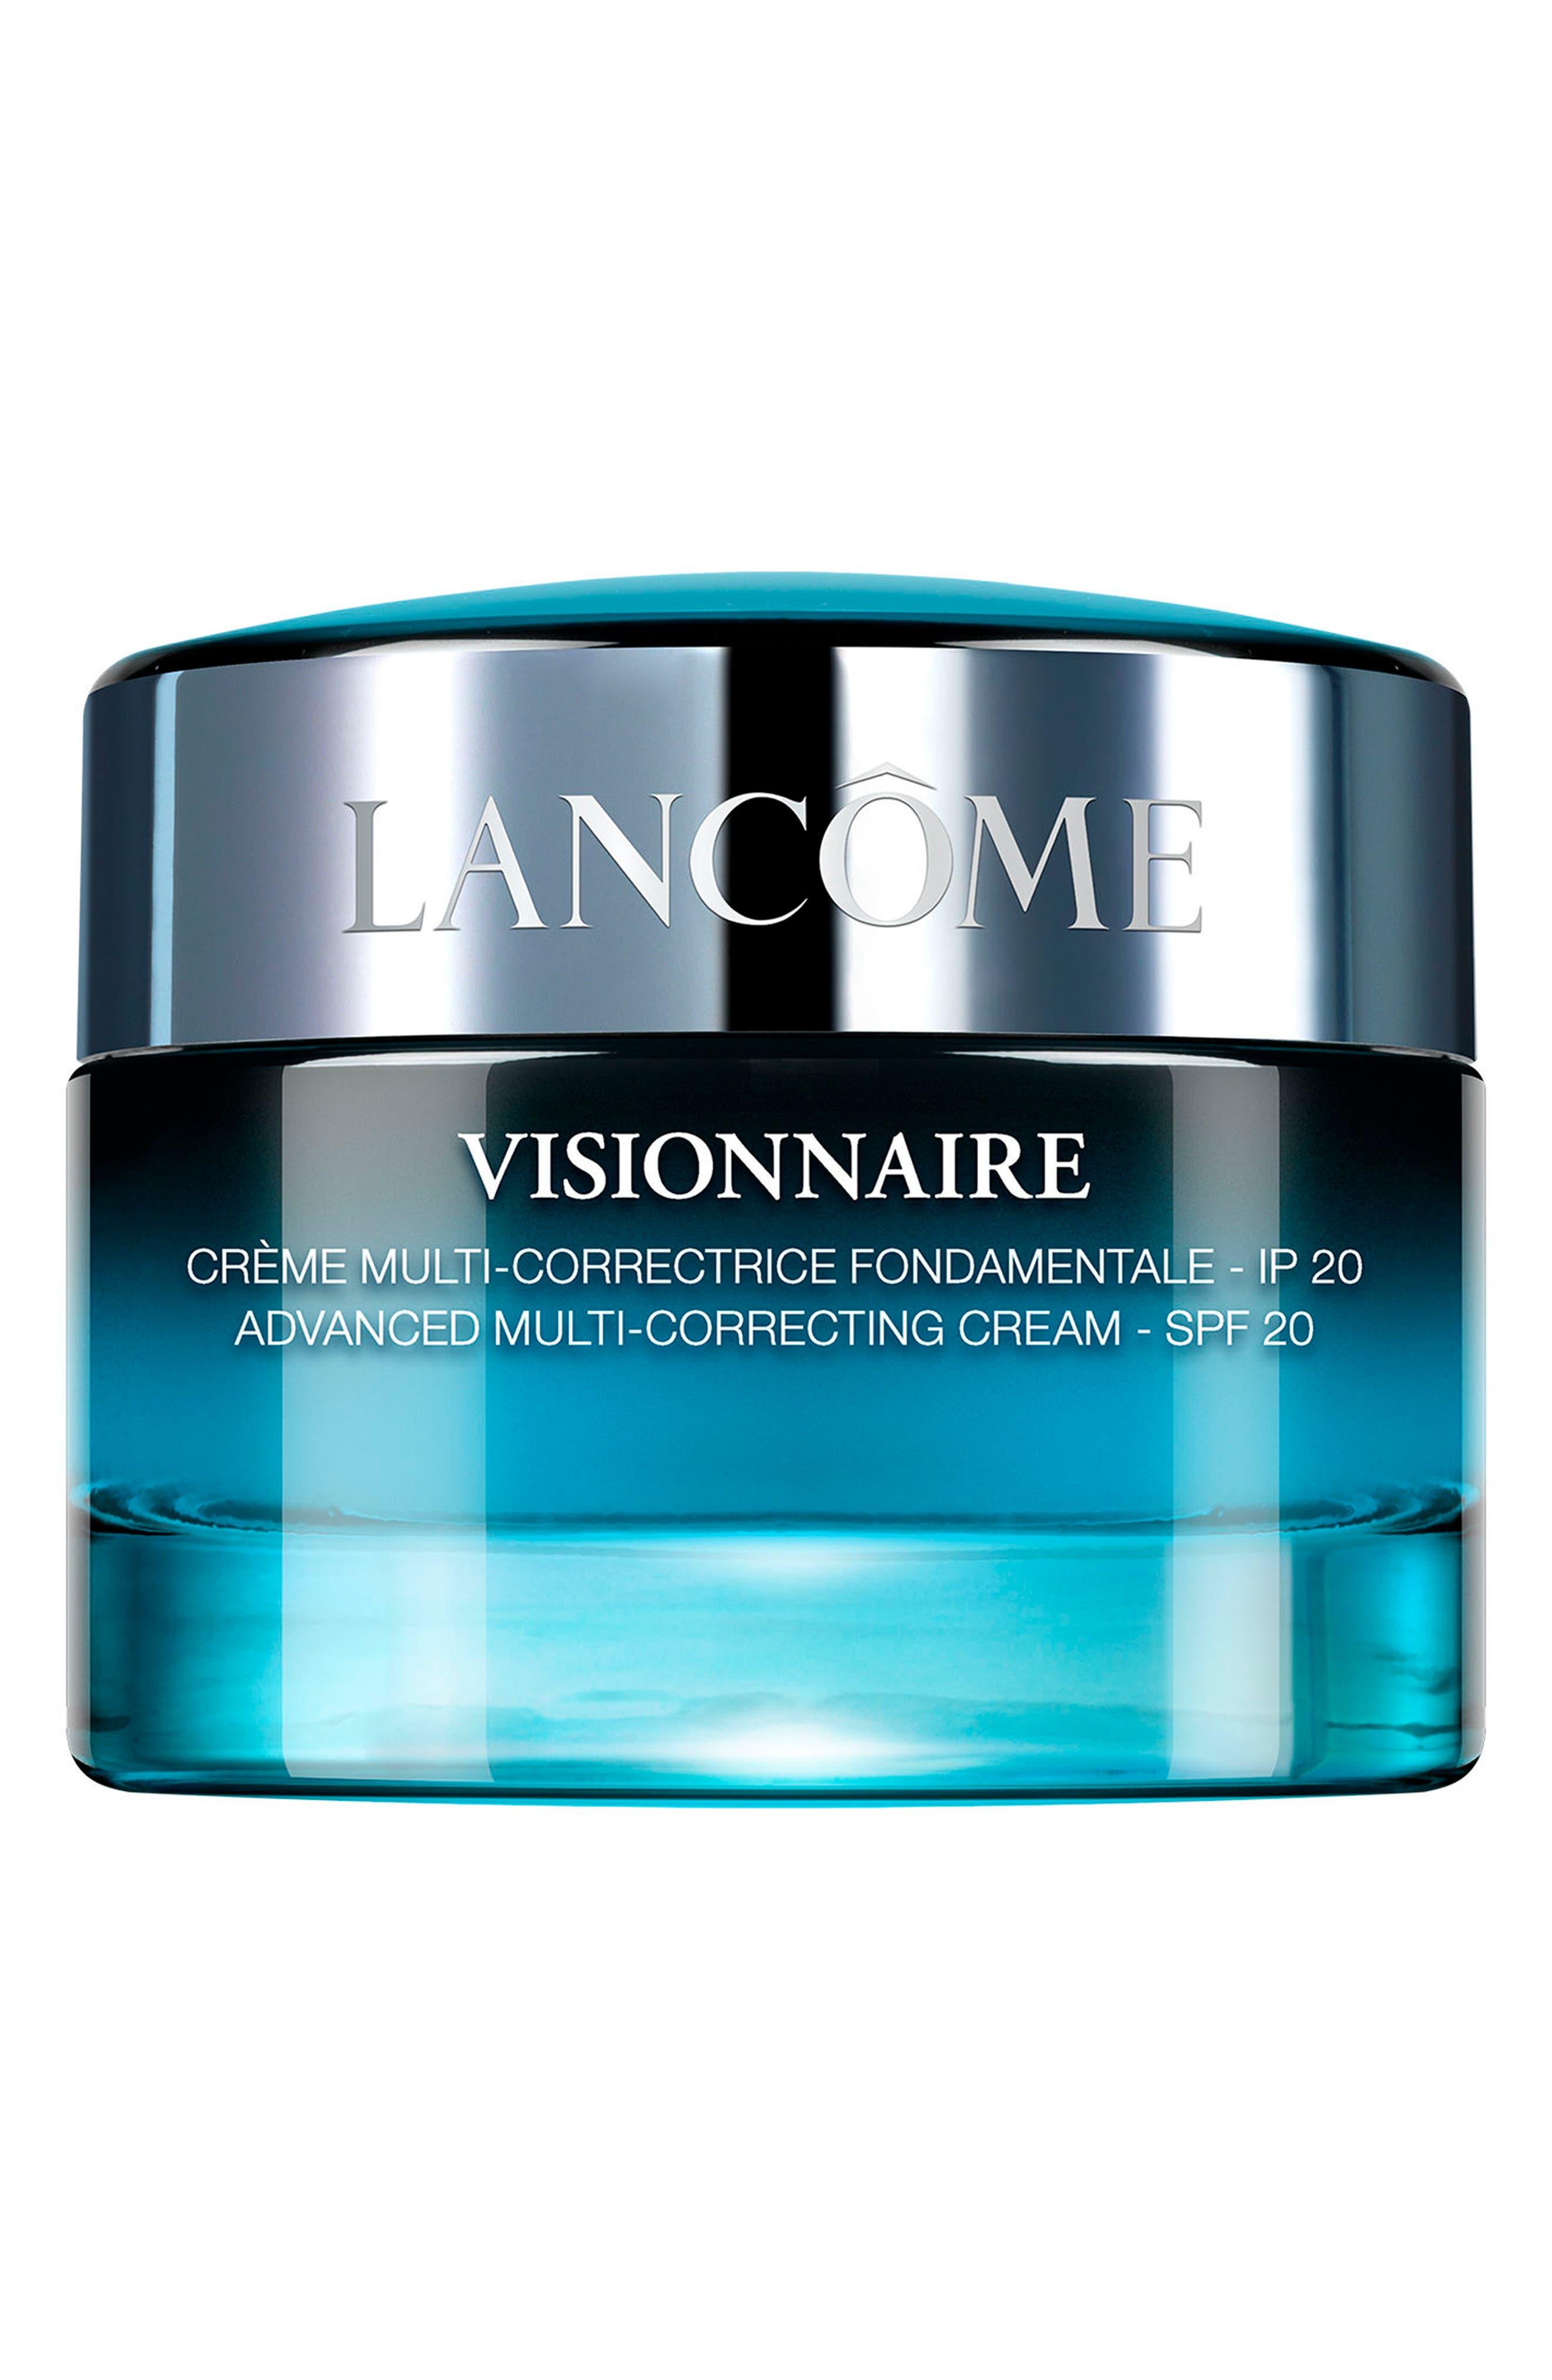 Visionnaire Advanced Multi-Correcting Cream Sunscreen Broad Spectrum SPF 20,                             Main thumbnail 1, color,                             NO COLOR